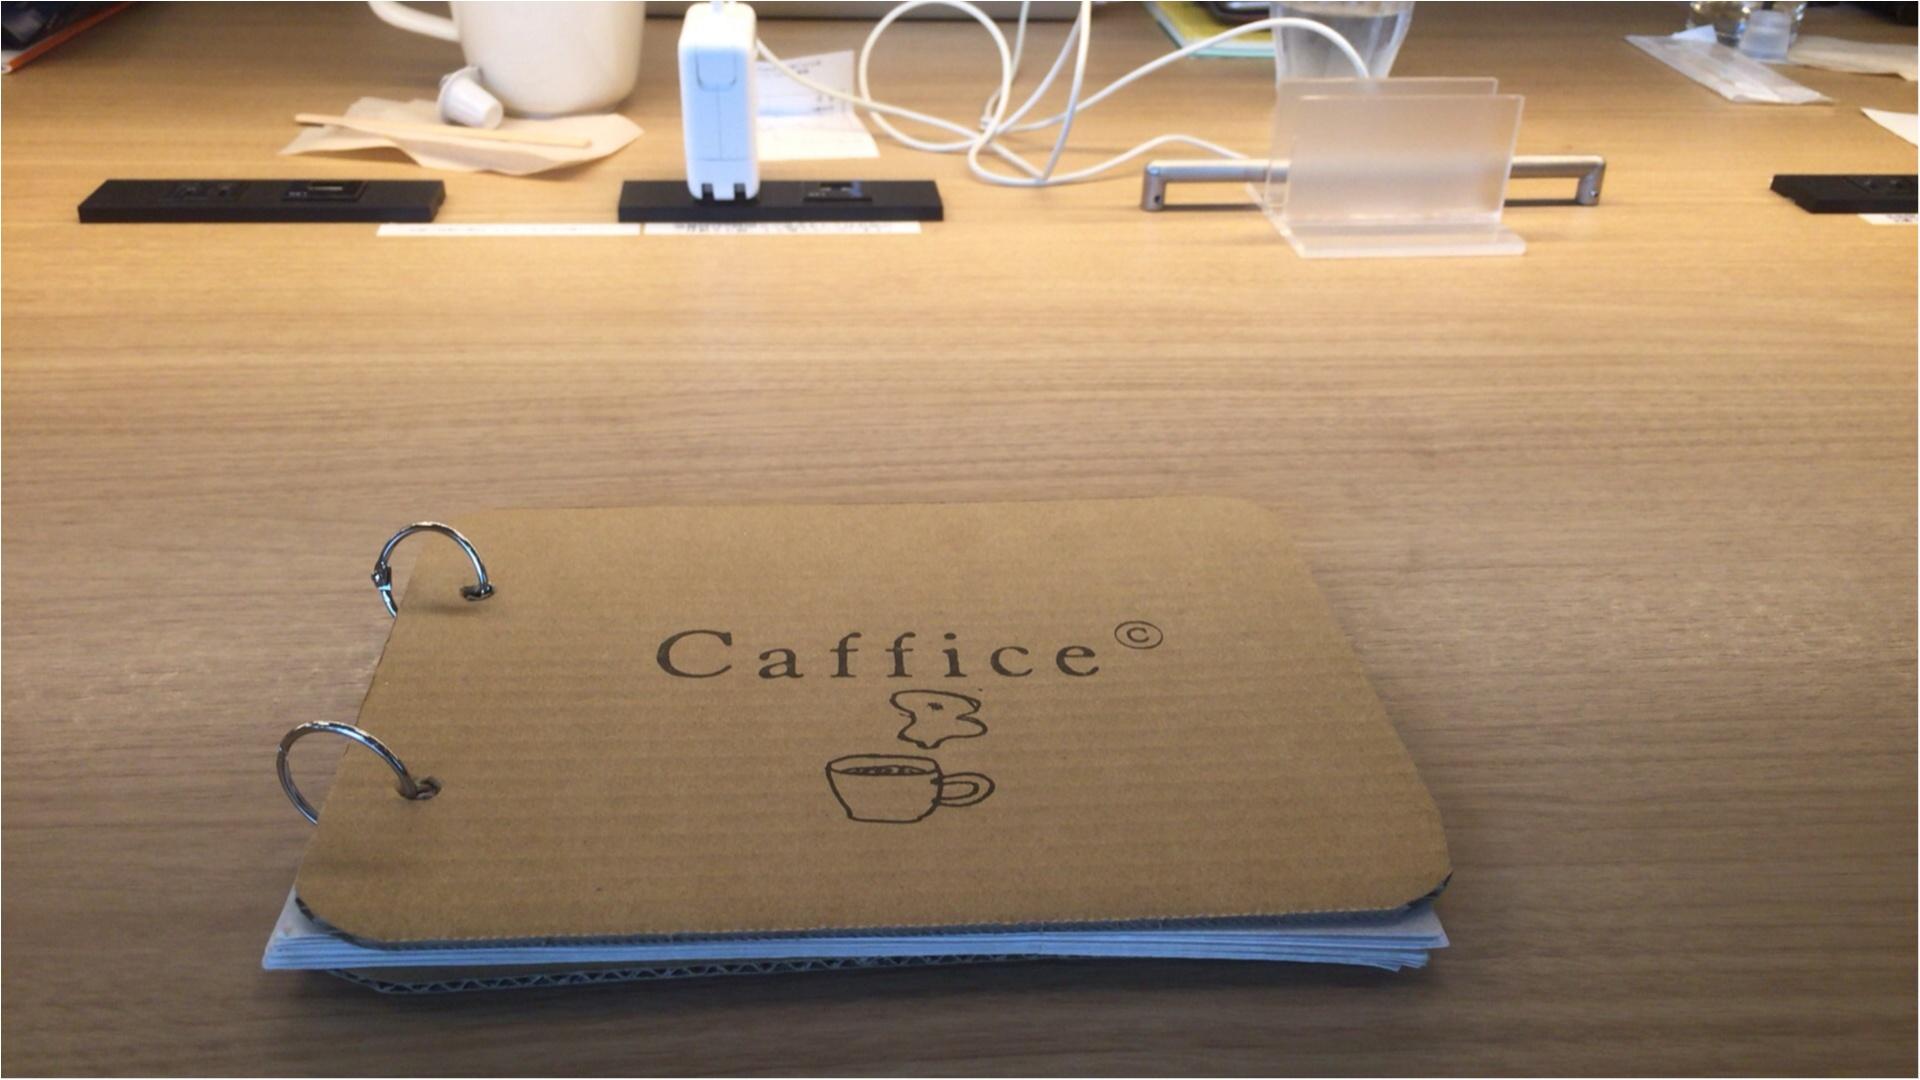 《*Cafe*》新宿三丁目駅直結!電源Wi-Fi完備のCAFE+Office✨メニューも充実のCafficeがお薦め☆_3